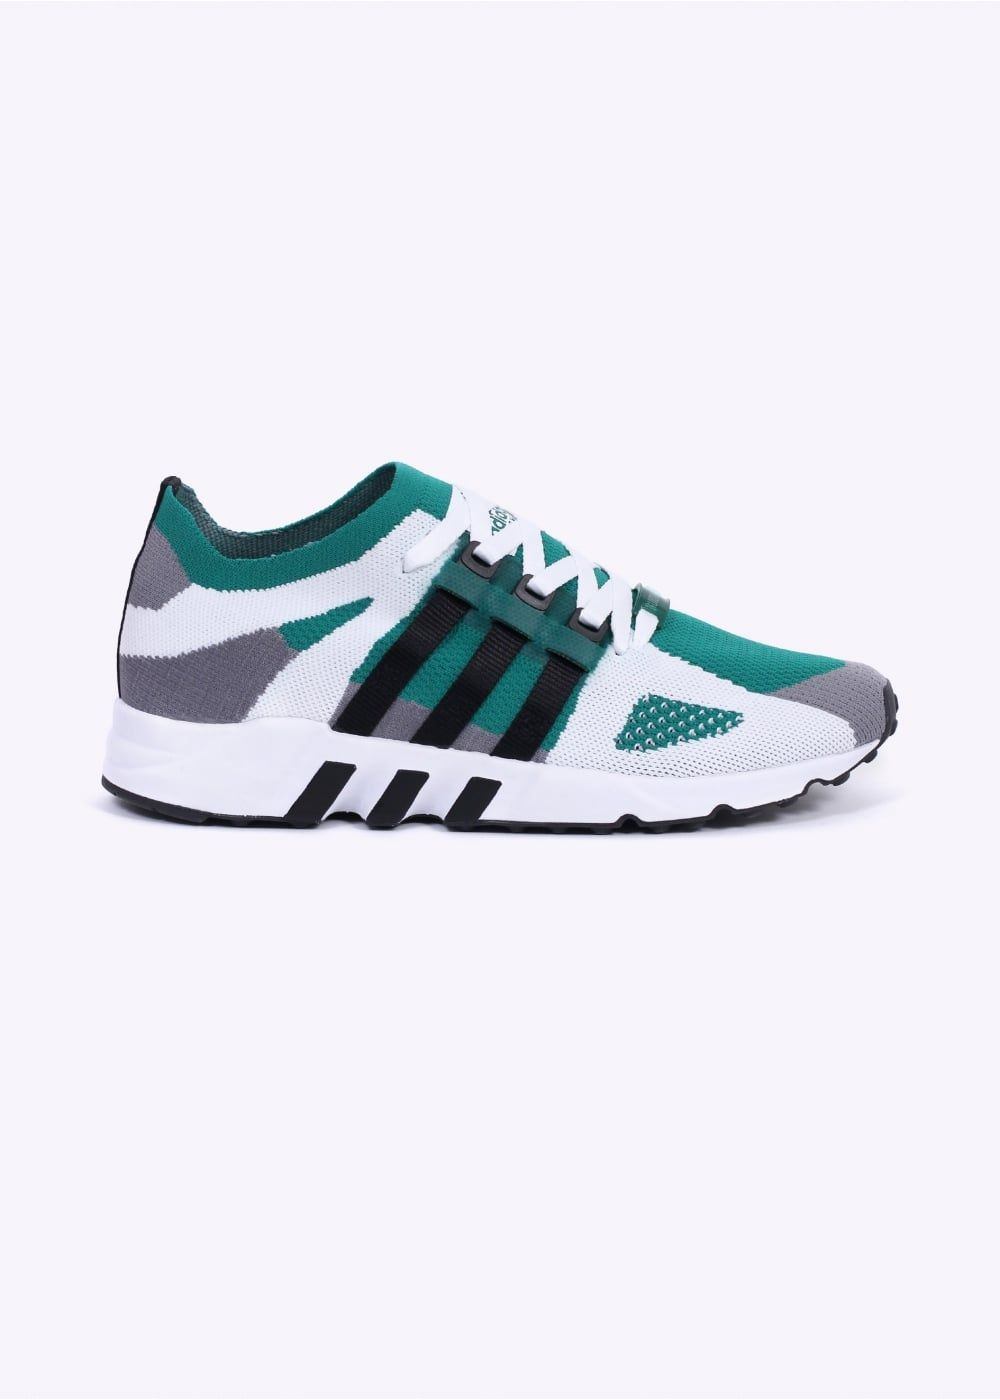 sale retailer 9d228 1f739 Adidas Originals Footwear EQT Running Guidance Primeknit - Grey  Black   Sub Green